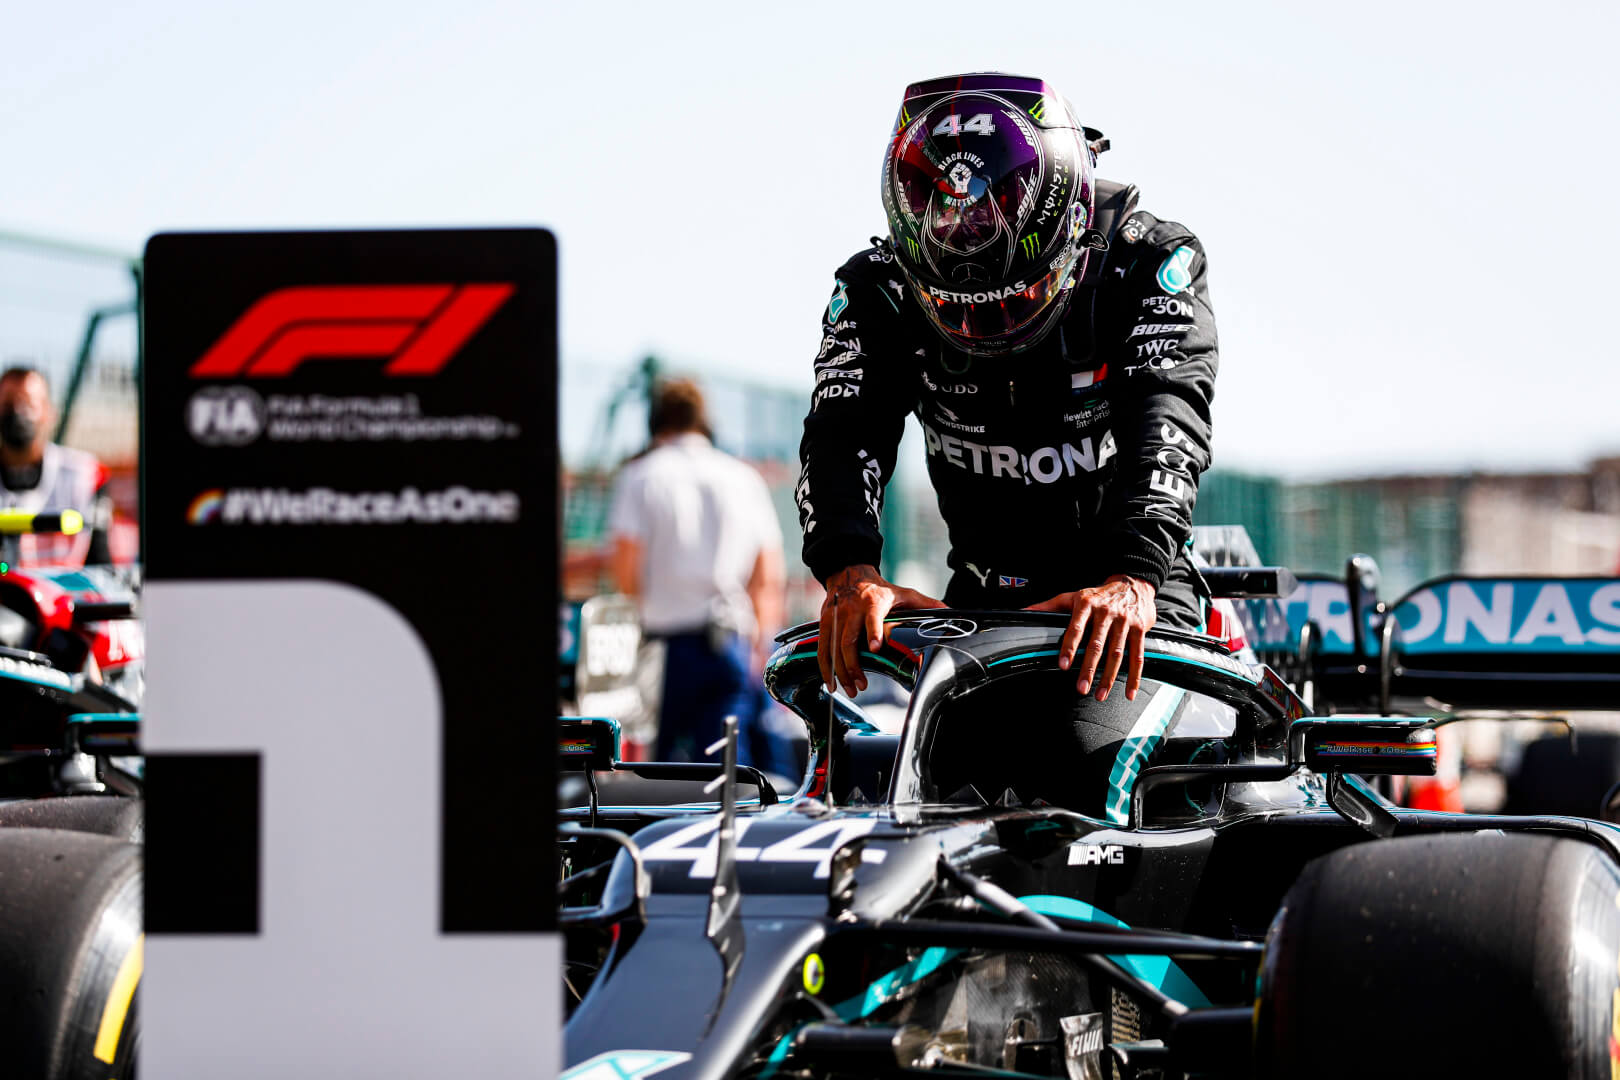 Lewis hamilton - Autódromo Internacional do Algarve (AIA) - F1 2020